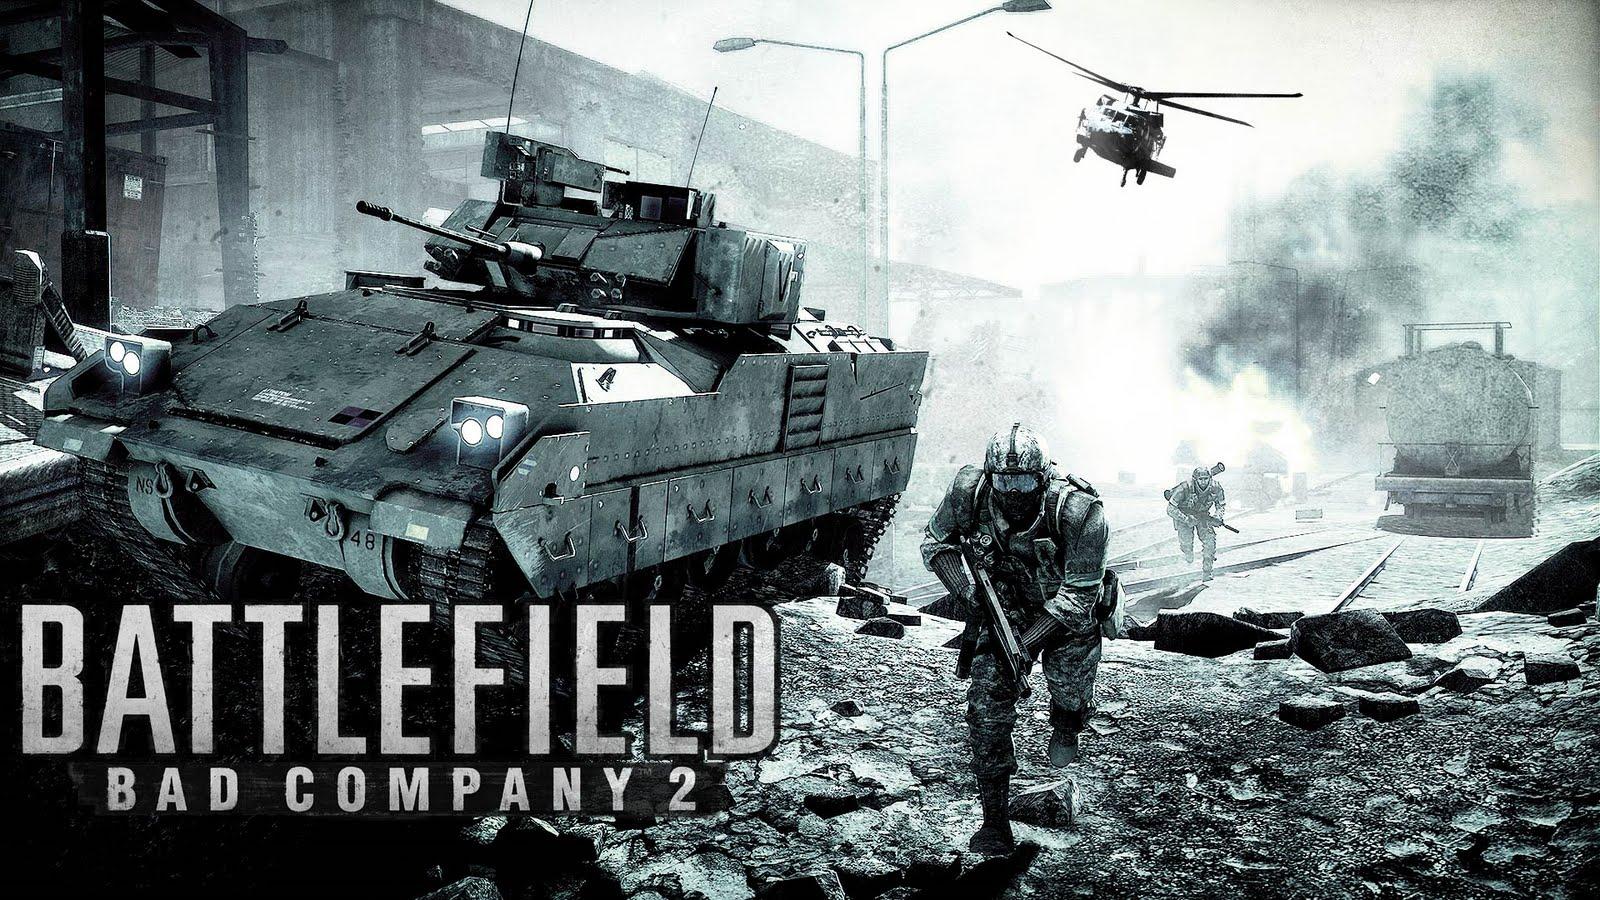 http://2.bp.blogspot.com/-e1BYrkCucS8/TtM5L-l5nAI/AAAAAAAAGsg/dK21TylZtsE/s1600/battlefield-bad-company-2-wallpaper-1.jpg